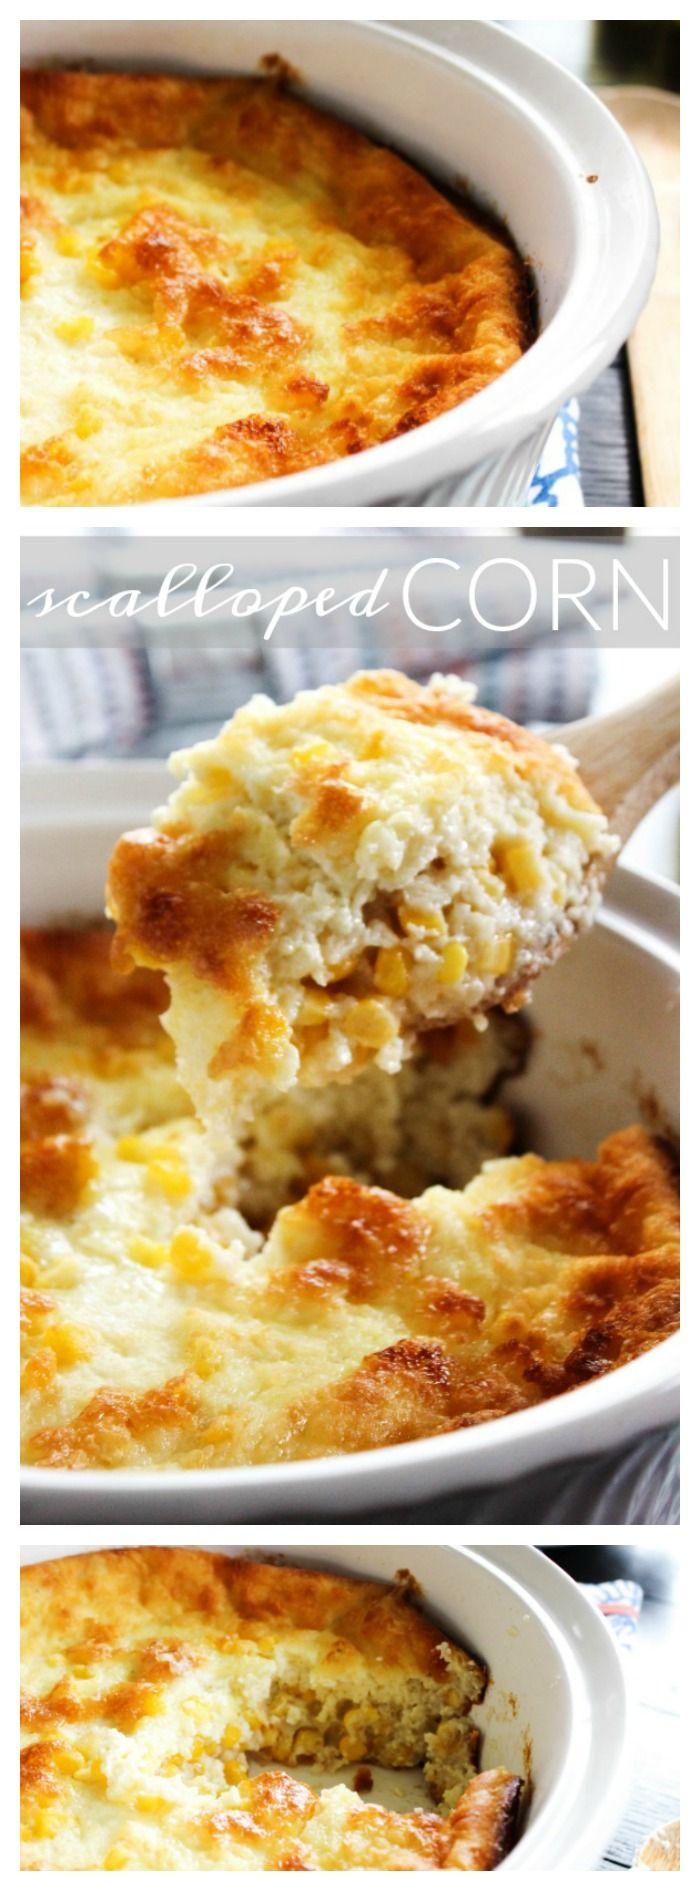 Scalloped Corn - t's like eating cornbread as a souffle. Best corn dish ever.